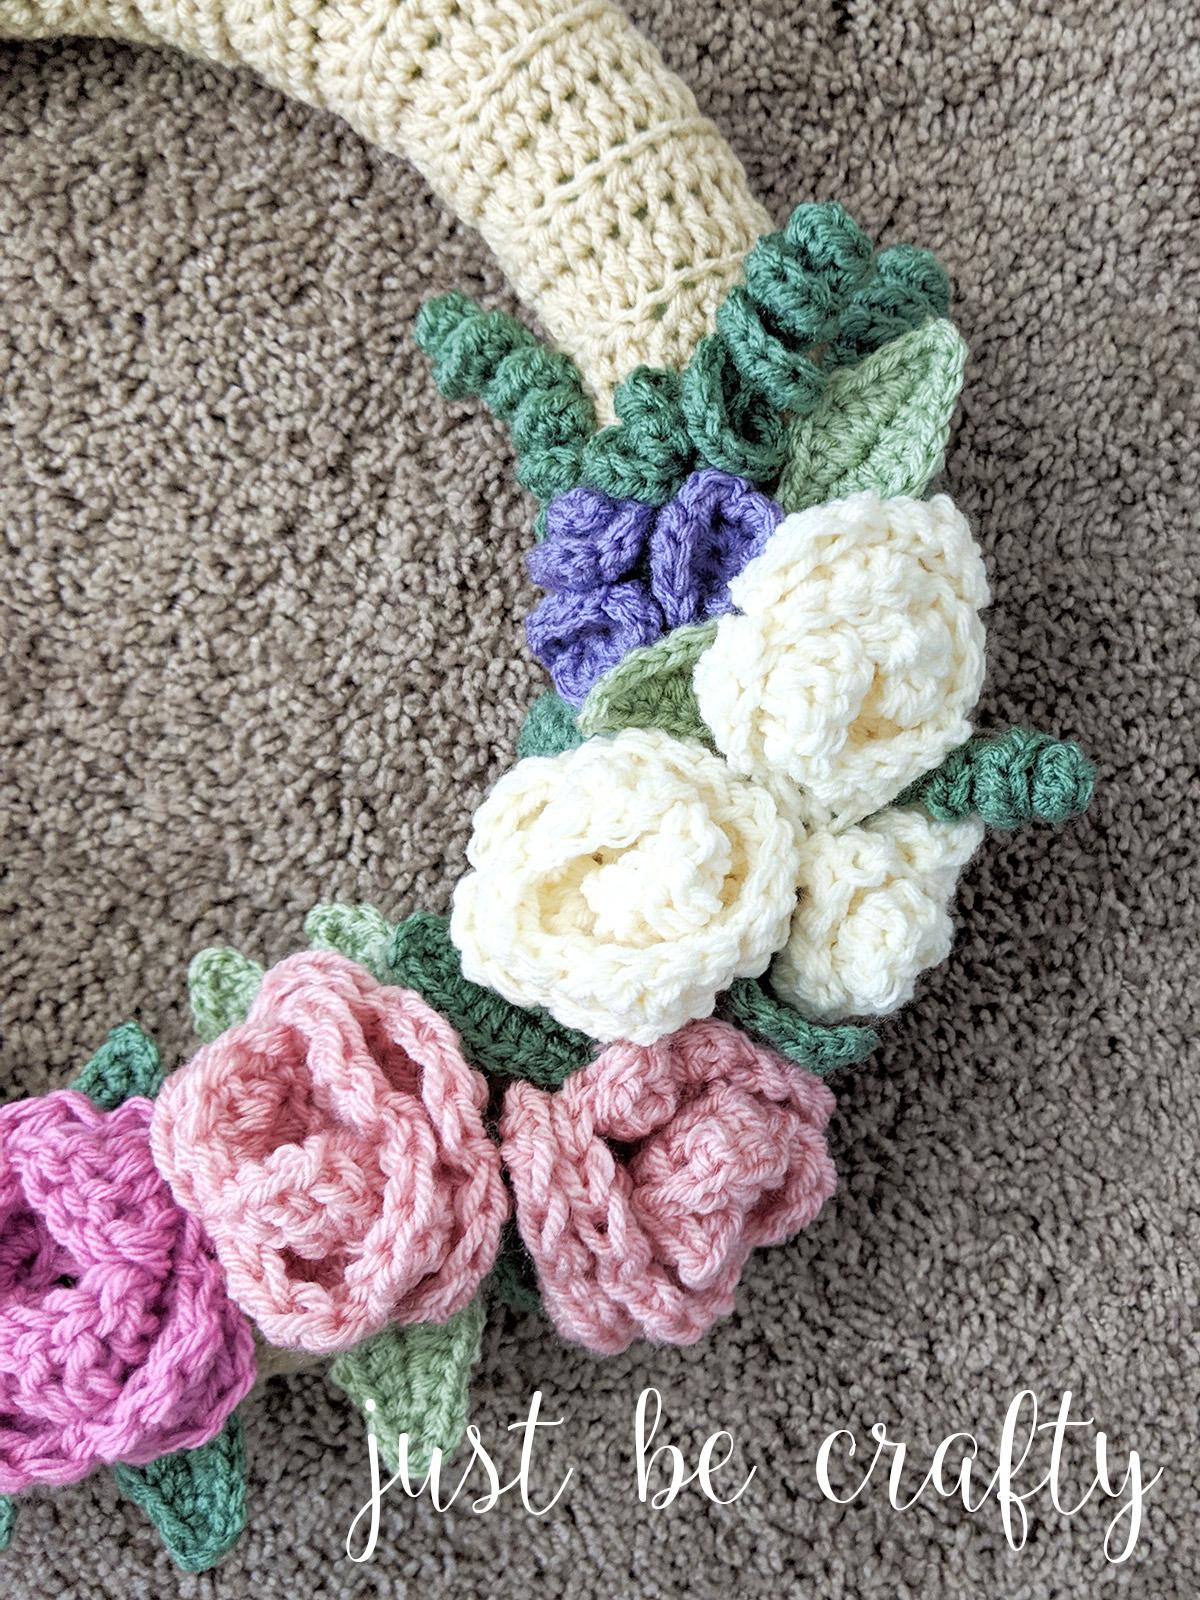 Crochet Spring Floral Wreath